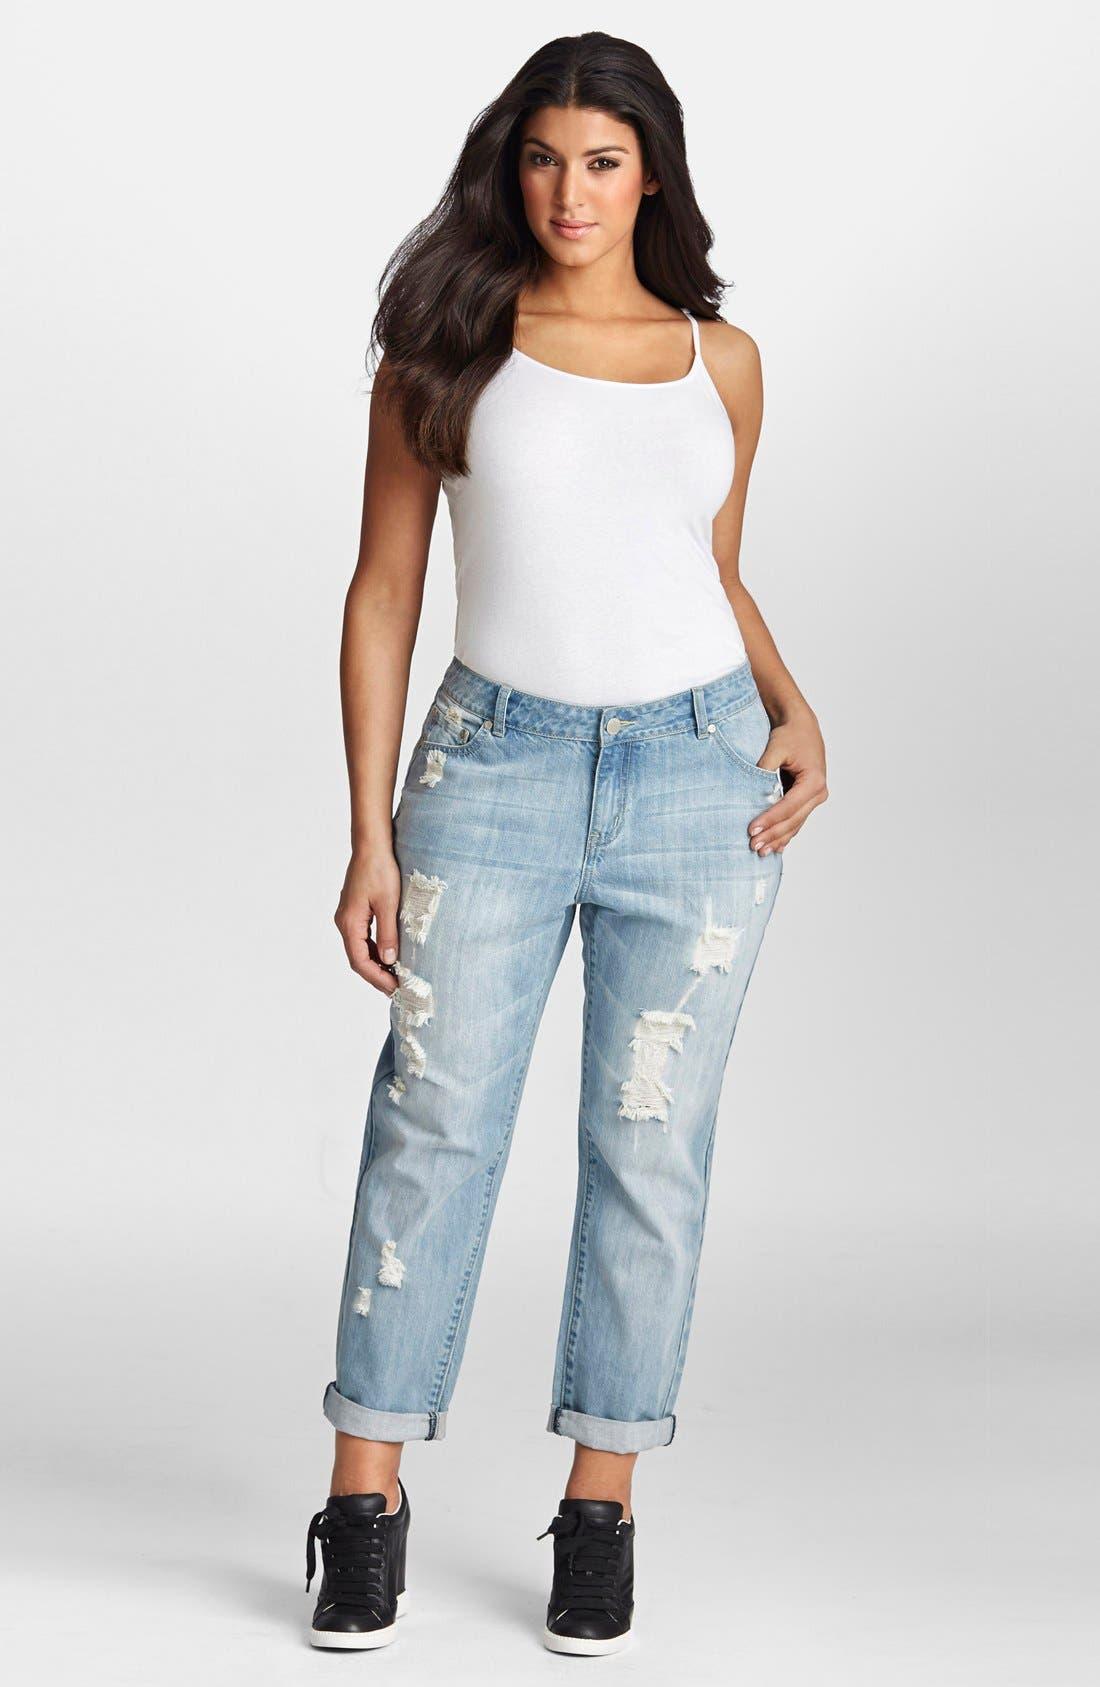 Designer Jeans For Plus Size Women